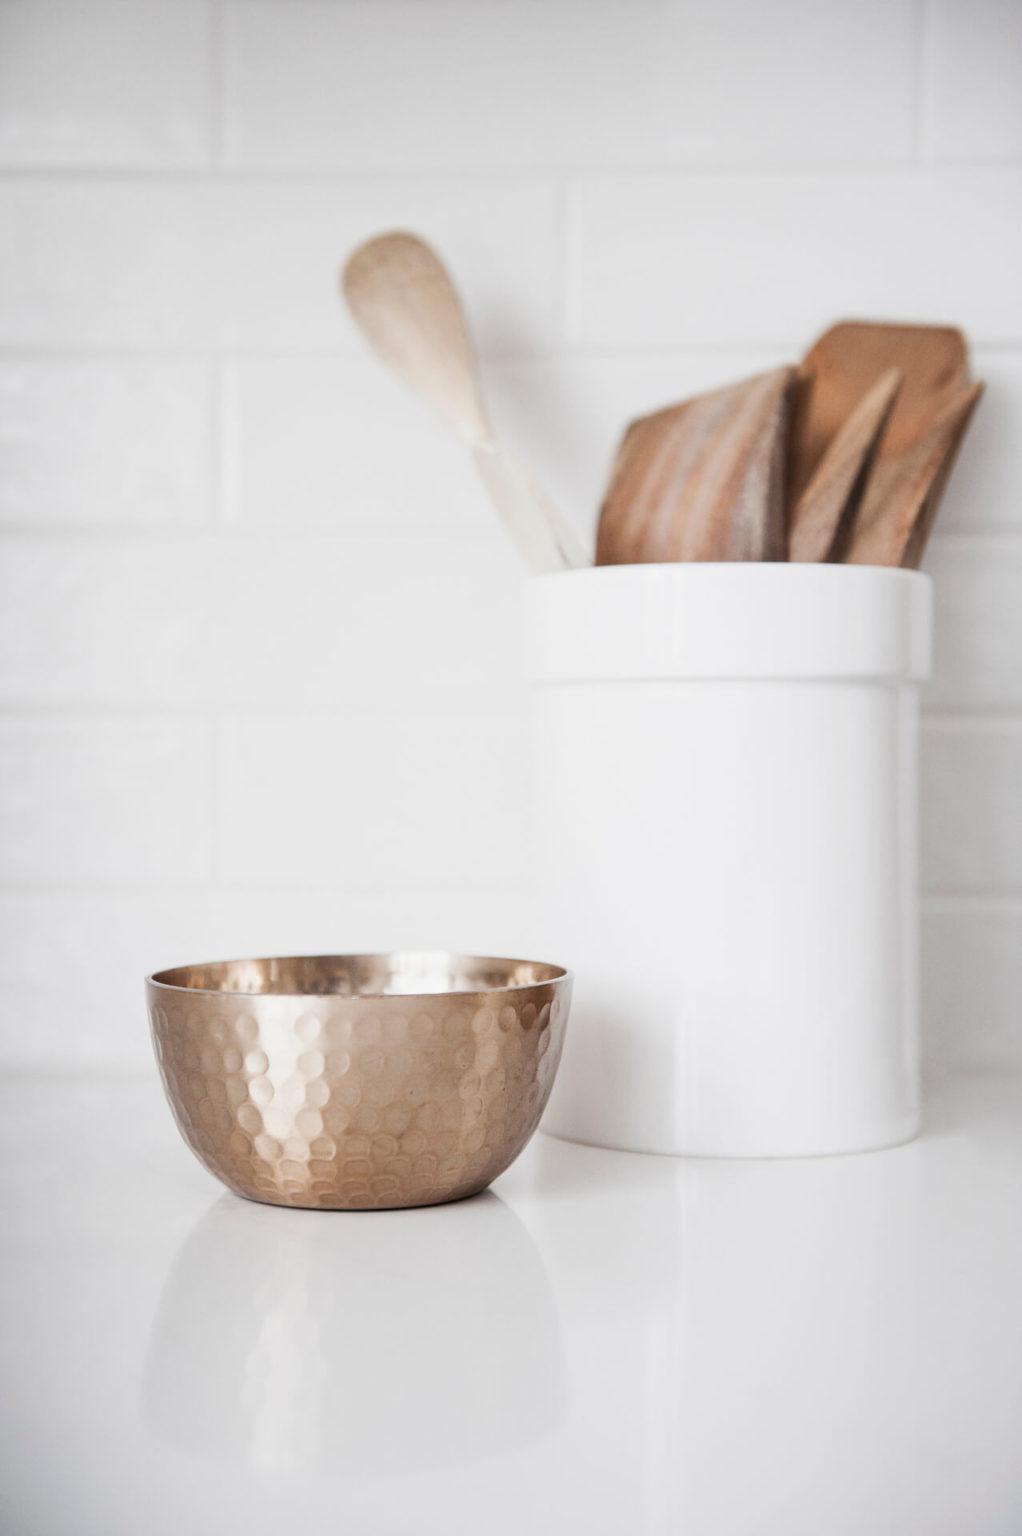 AKB Design cuisine blanche armoire noire poignee laiton comptoir quartz garde manger 27